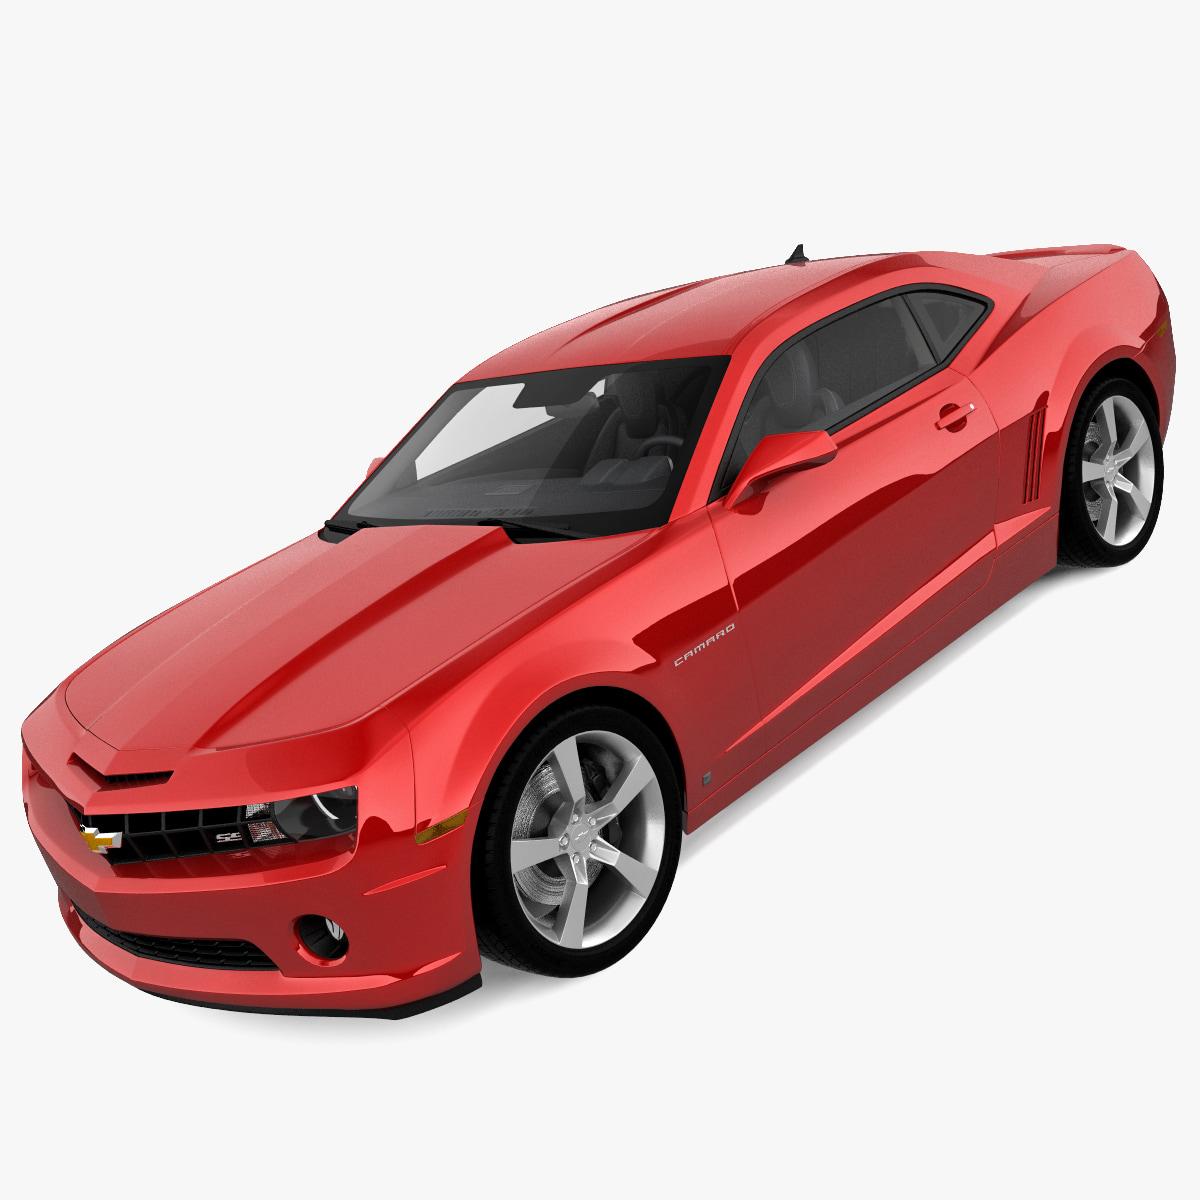 Chevrolet_Camaro_00.jpg